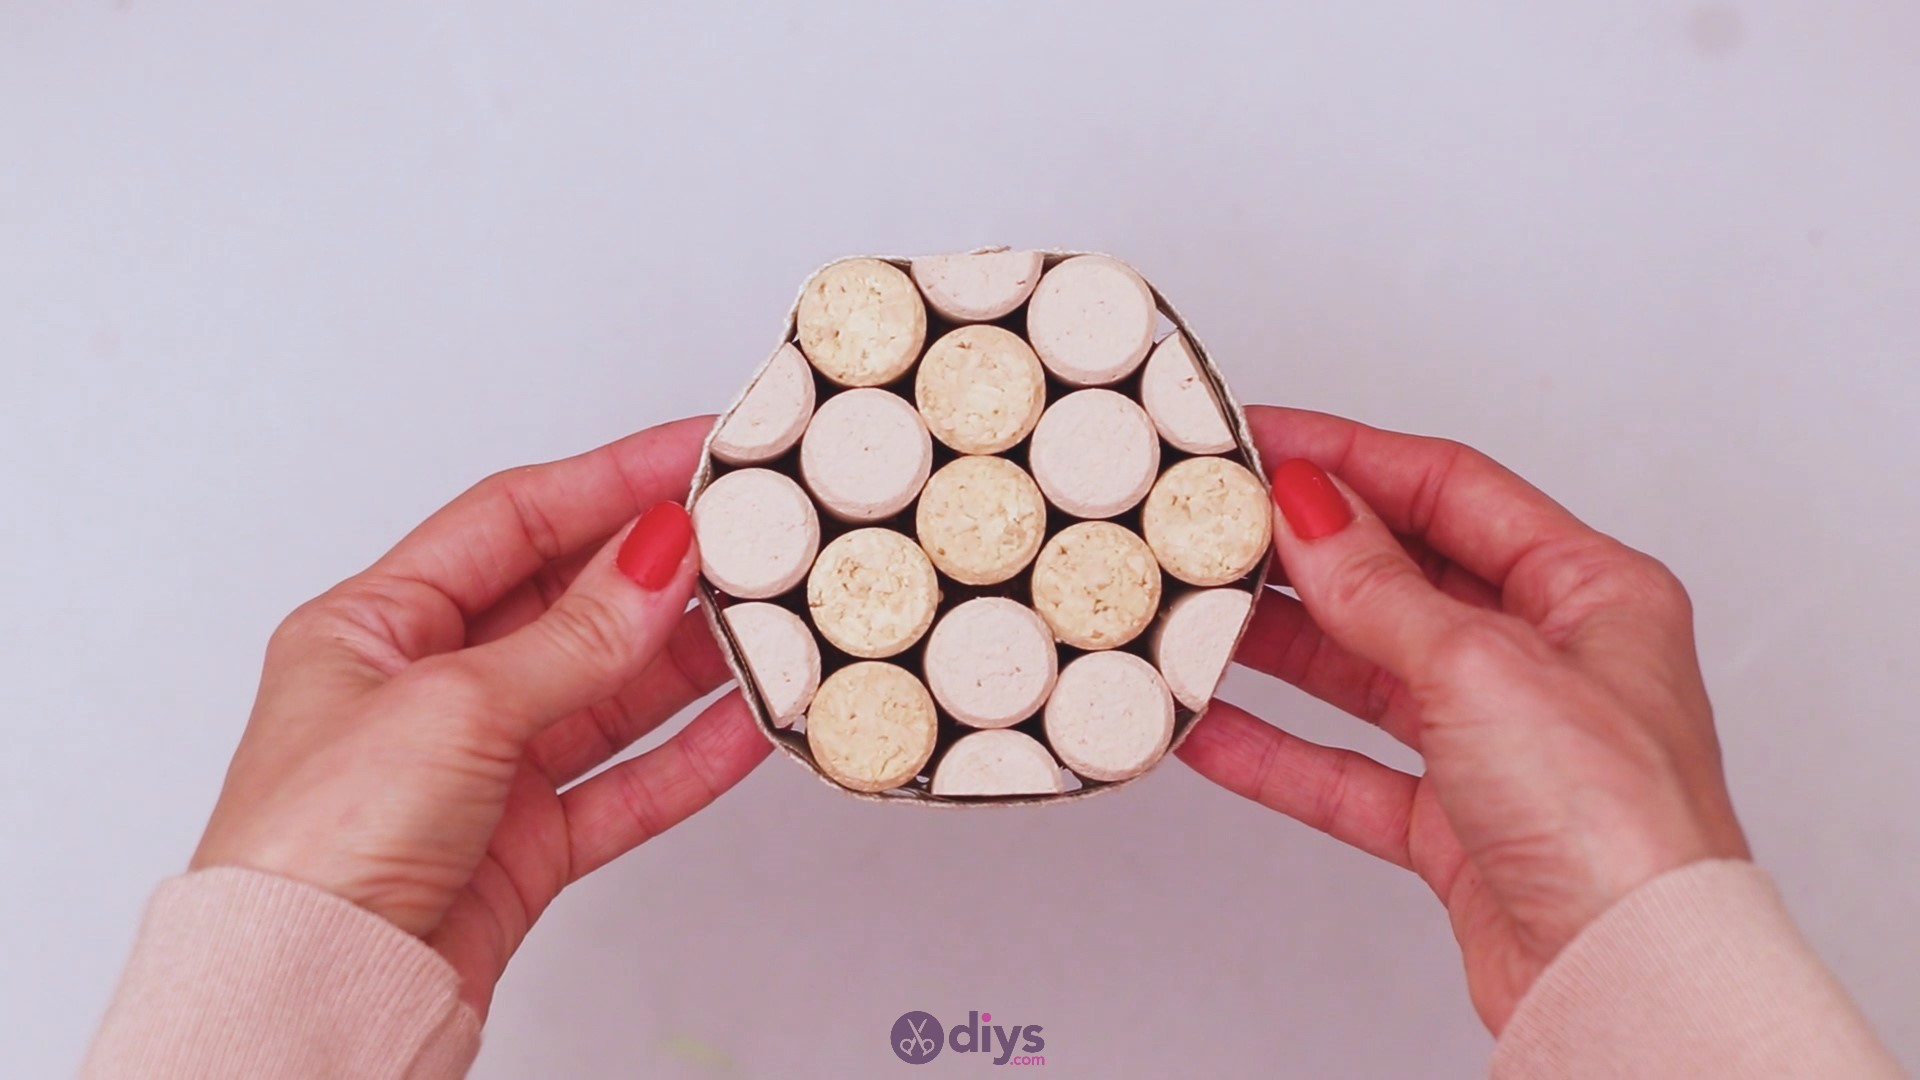 Diy wine cork coaster (50)